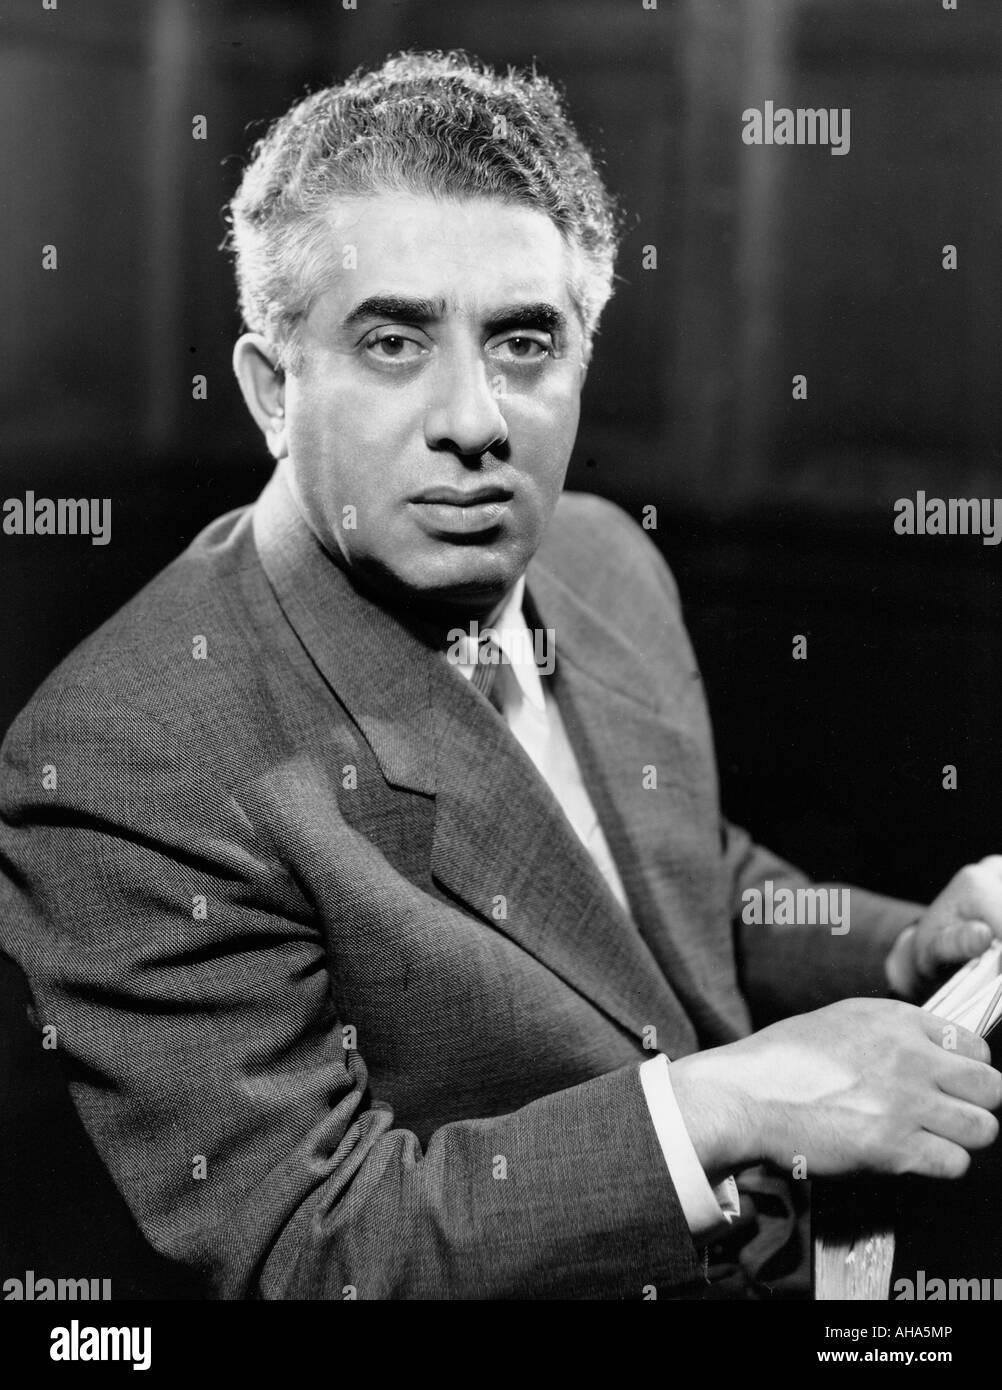 ARAN KHACHATURIAN  Armenian composer  in 1955 - Stock Image